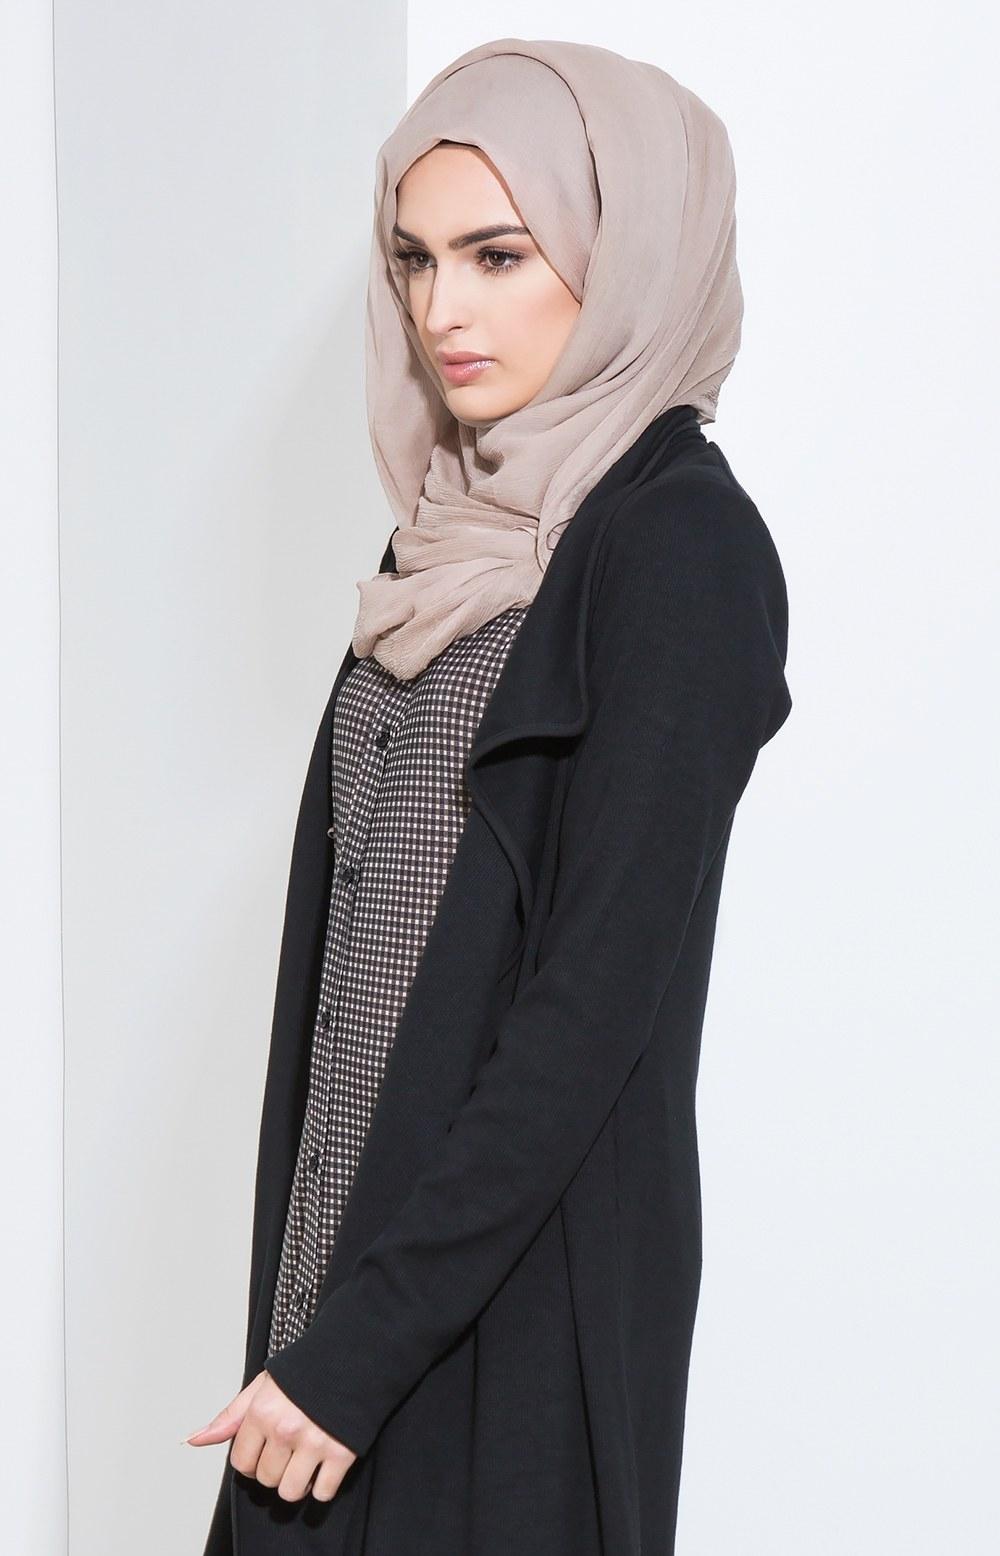 Model Model Baju Lebaran Tahun 2017 Mndw 25 Trend Model Baju Muslim Lebaran 2018 Simple & Modis